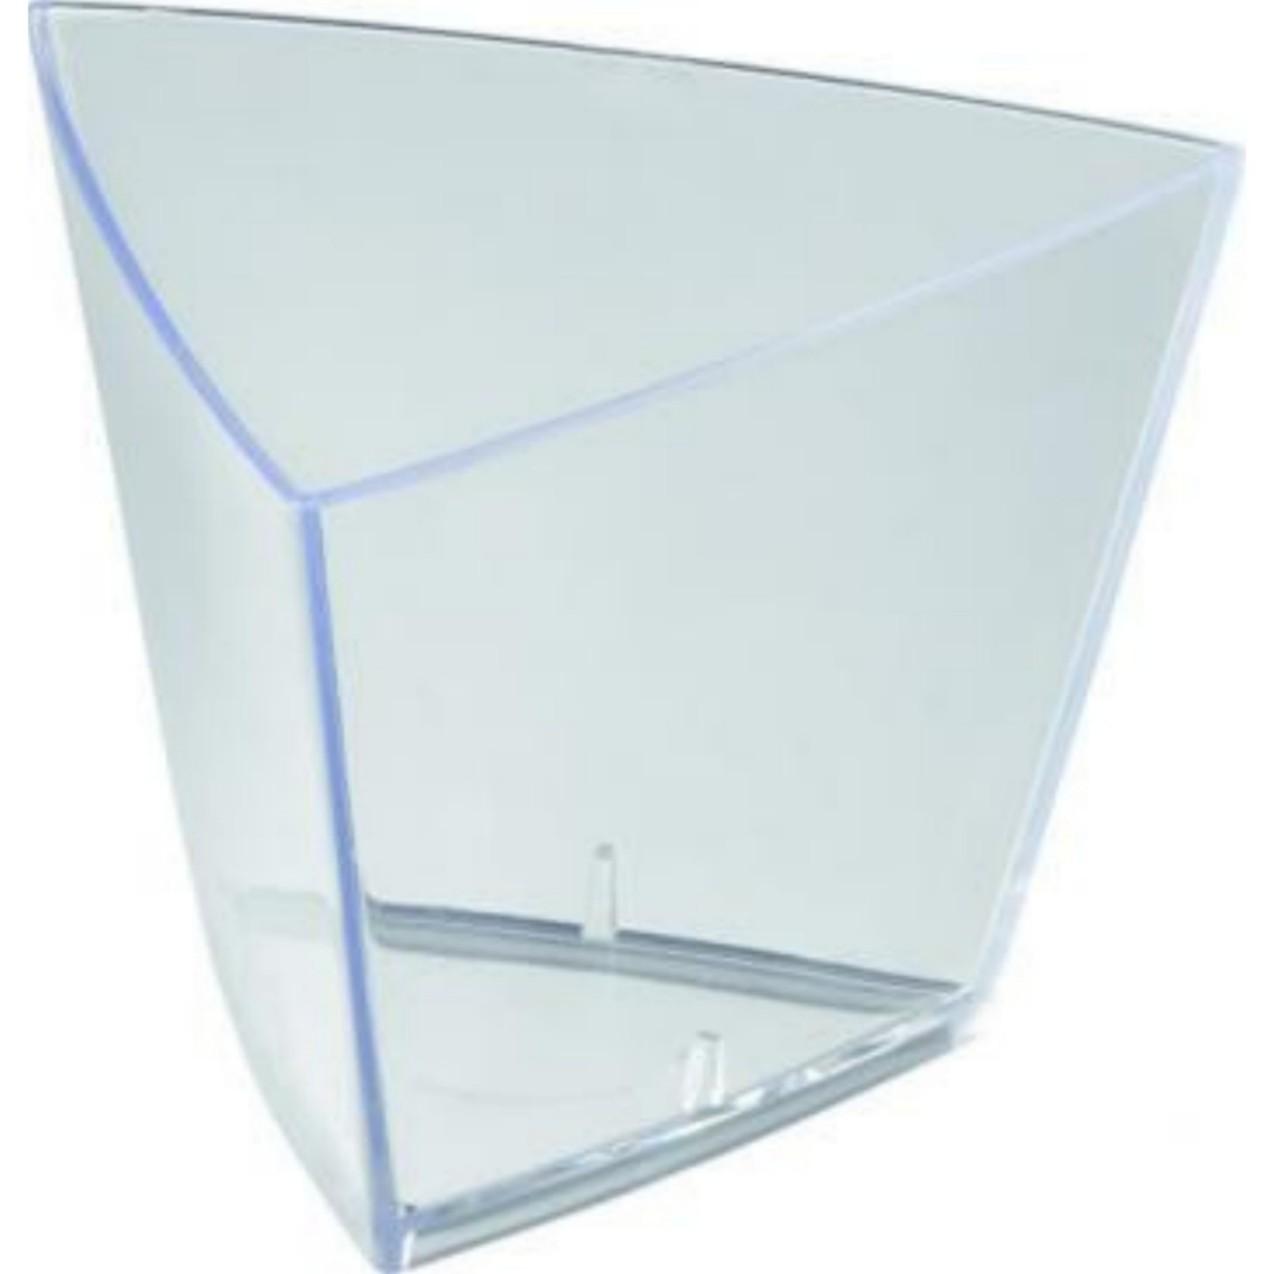 Pohárek trojúhelník M, balení 90ks